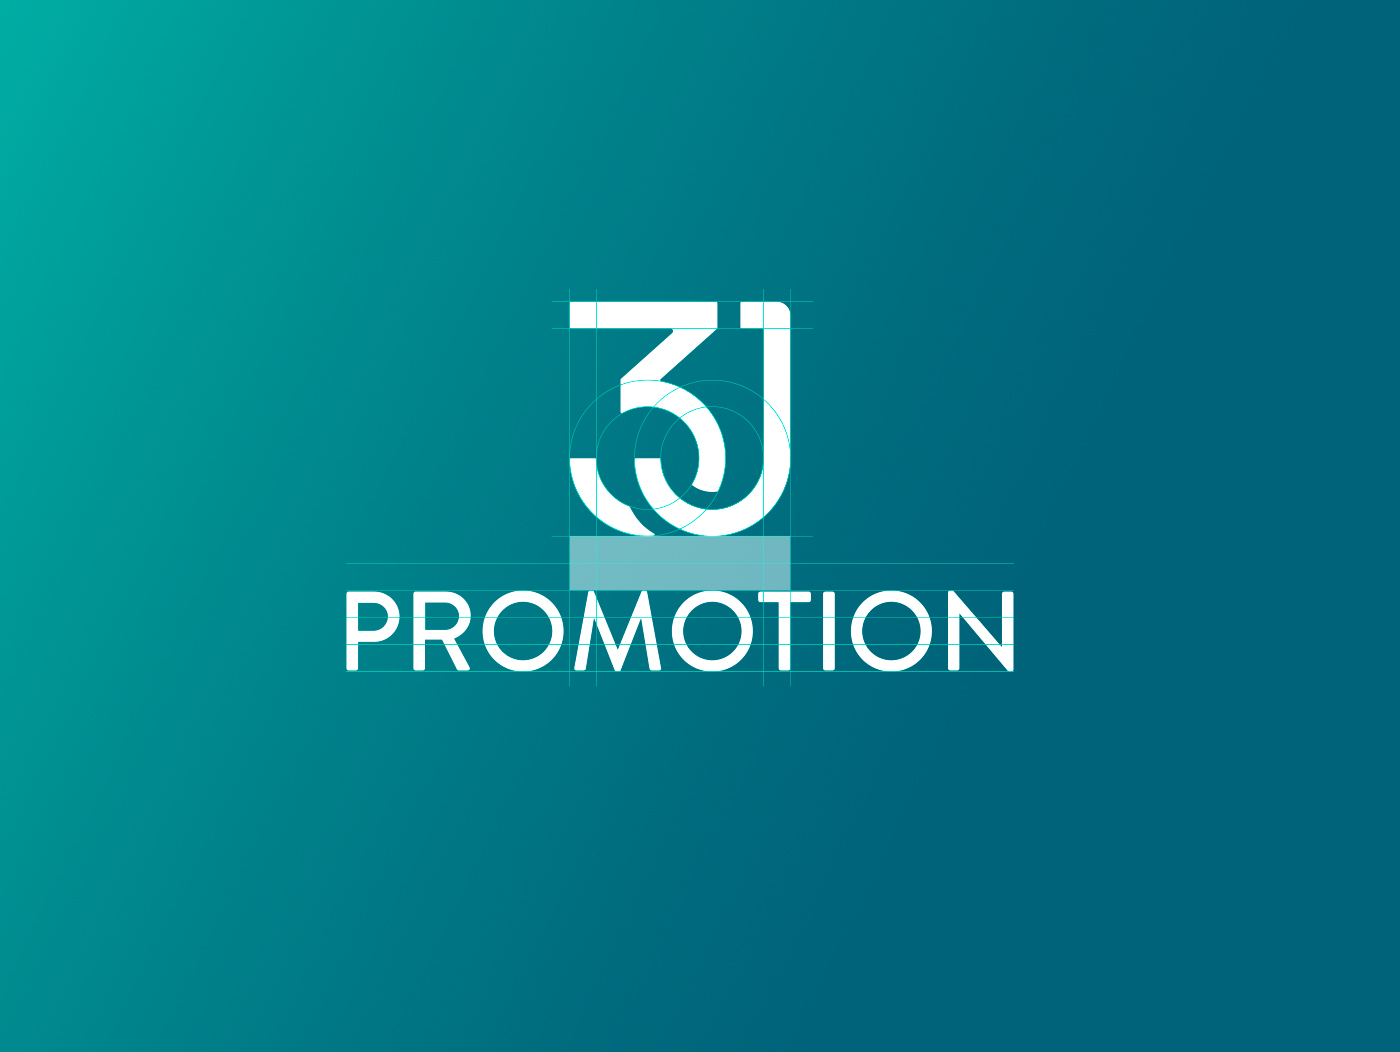 3J immobilier logo construction - mathieu Dupuis Freelance